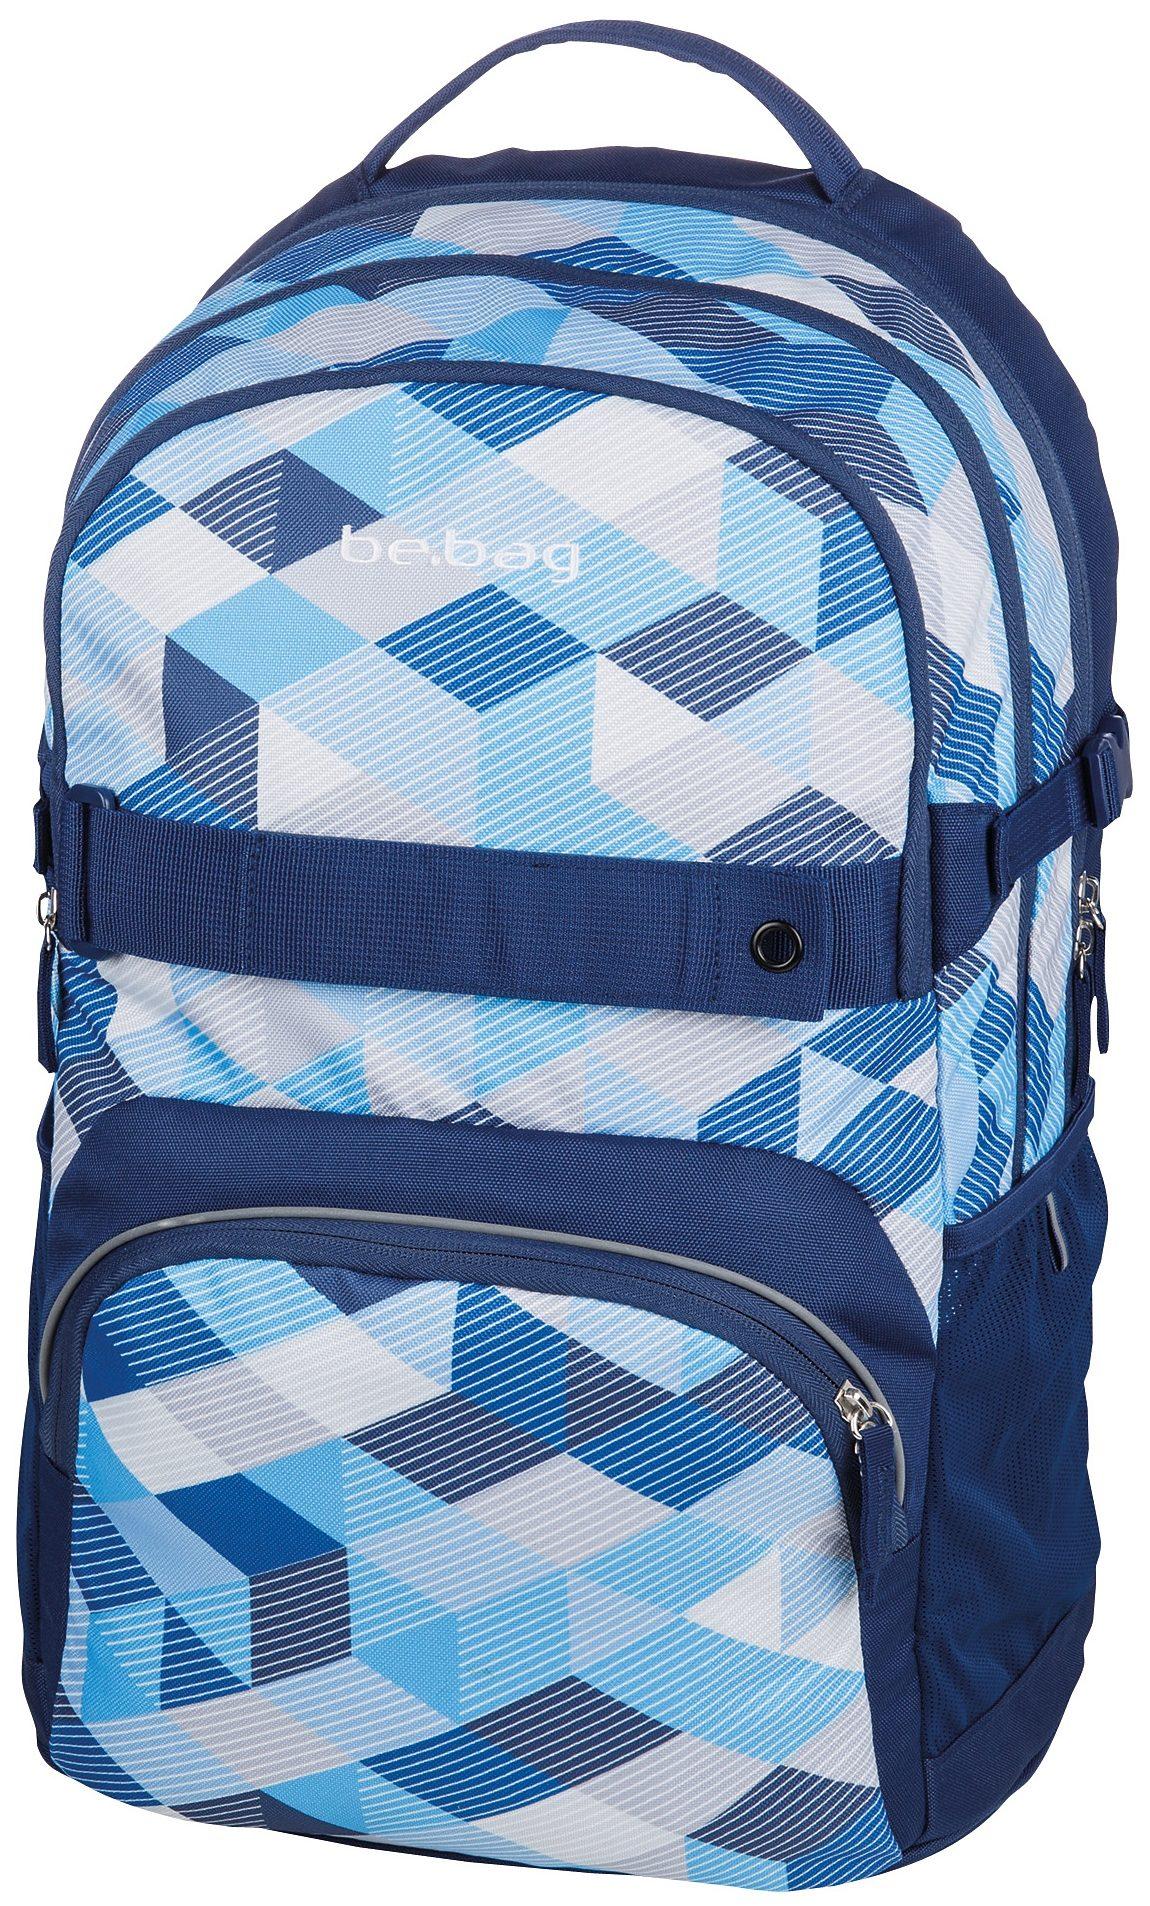 Herlitz Schulrucksack, »be.bag cube, Blue Checked«